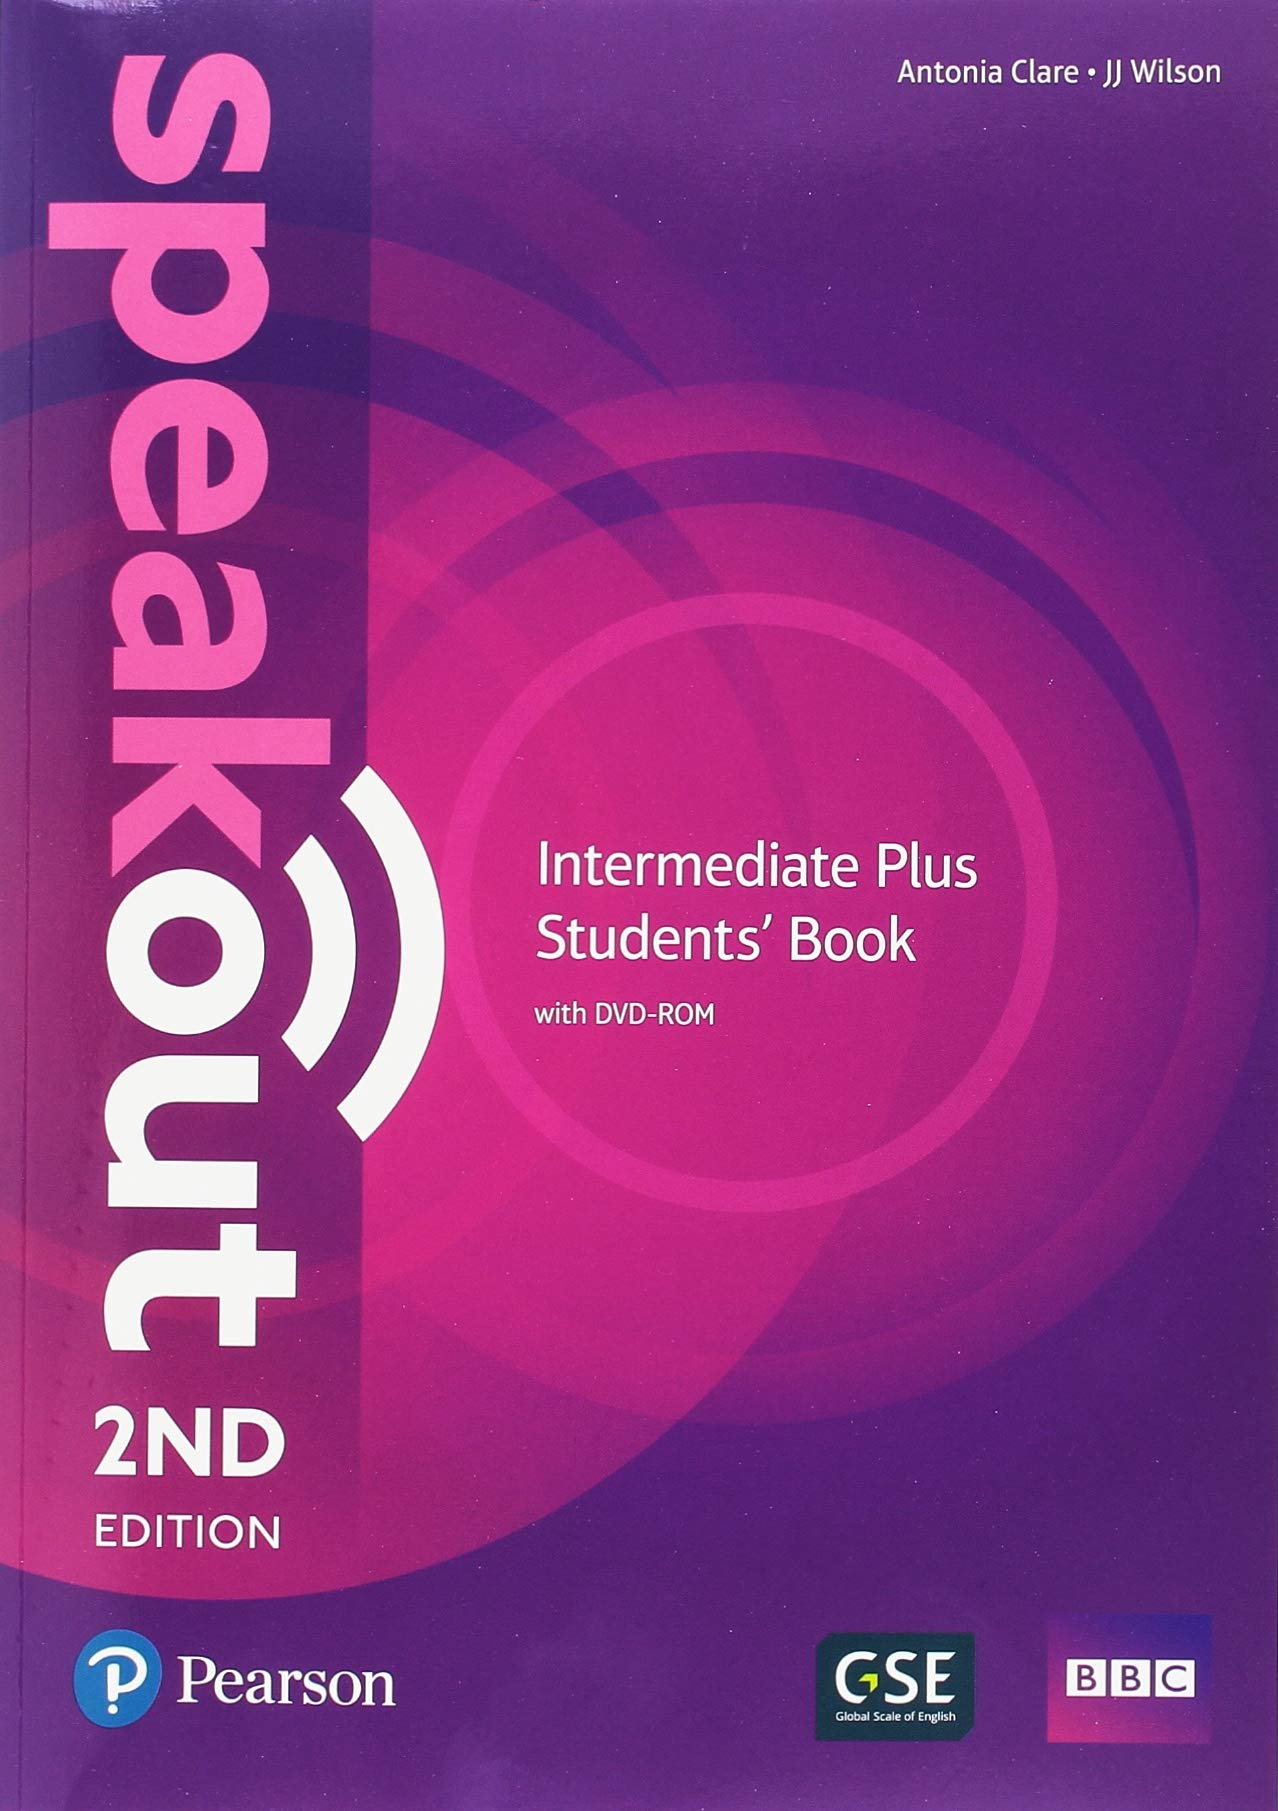 Speakout Intermediate Plus 2nd Edition Students Book/DVD-ROM/Workbook/Study Booster Spain Pack: Amazon.es: Clare, Antonia, Wilson, JJ: Libros en idiomas extranjeros